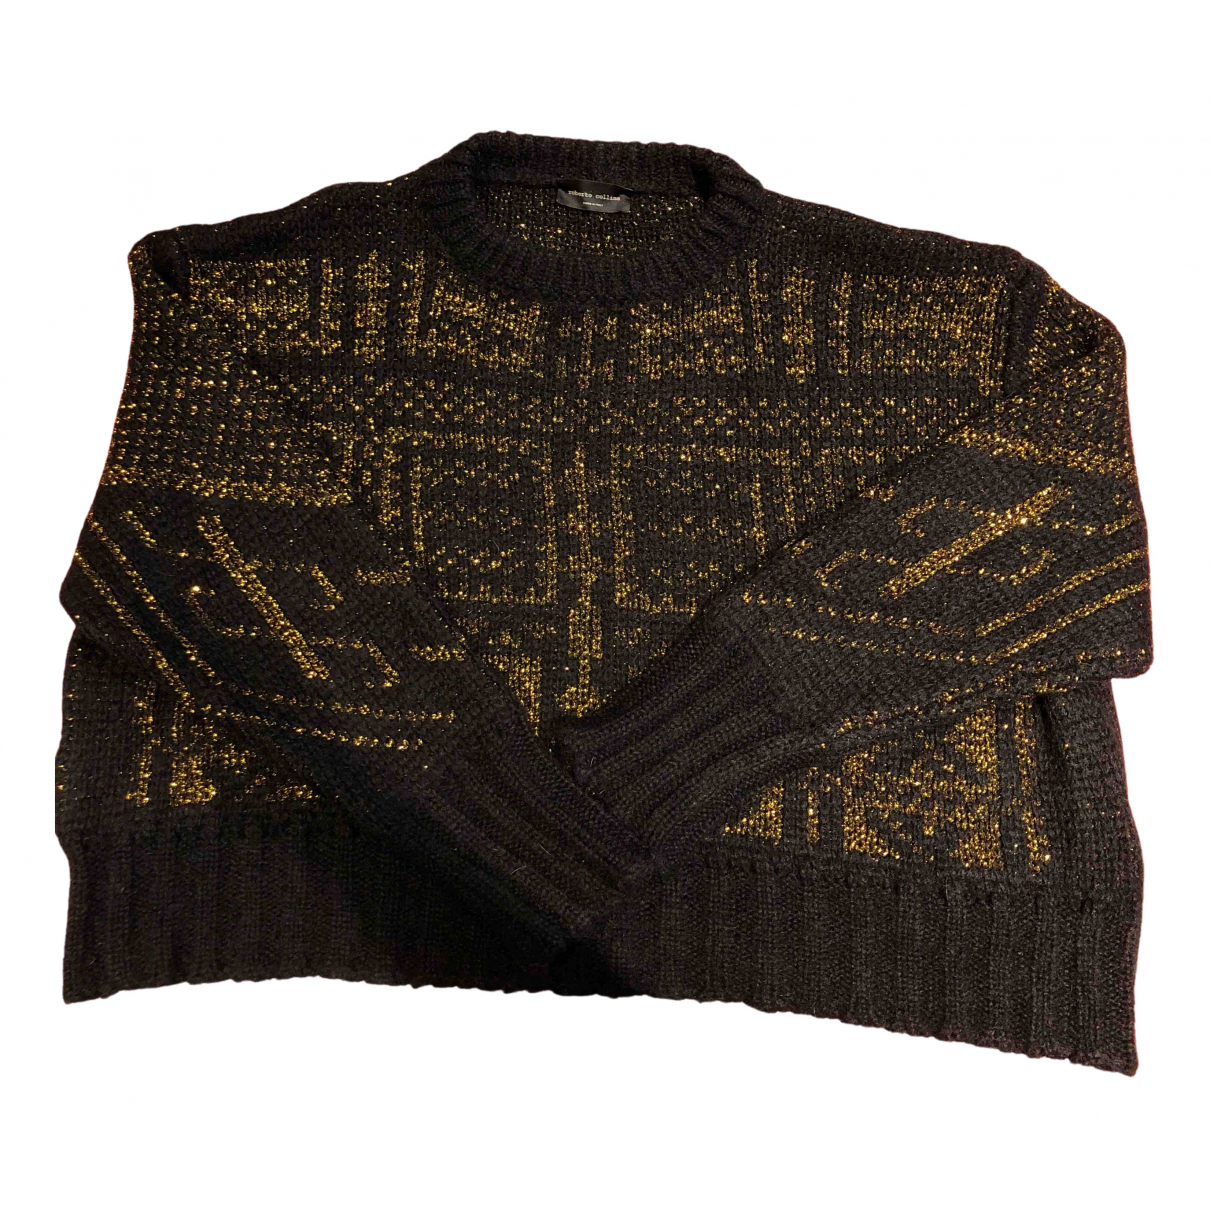 Roberto Collina N Black Wool Knitwear for Women S International